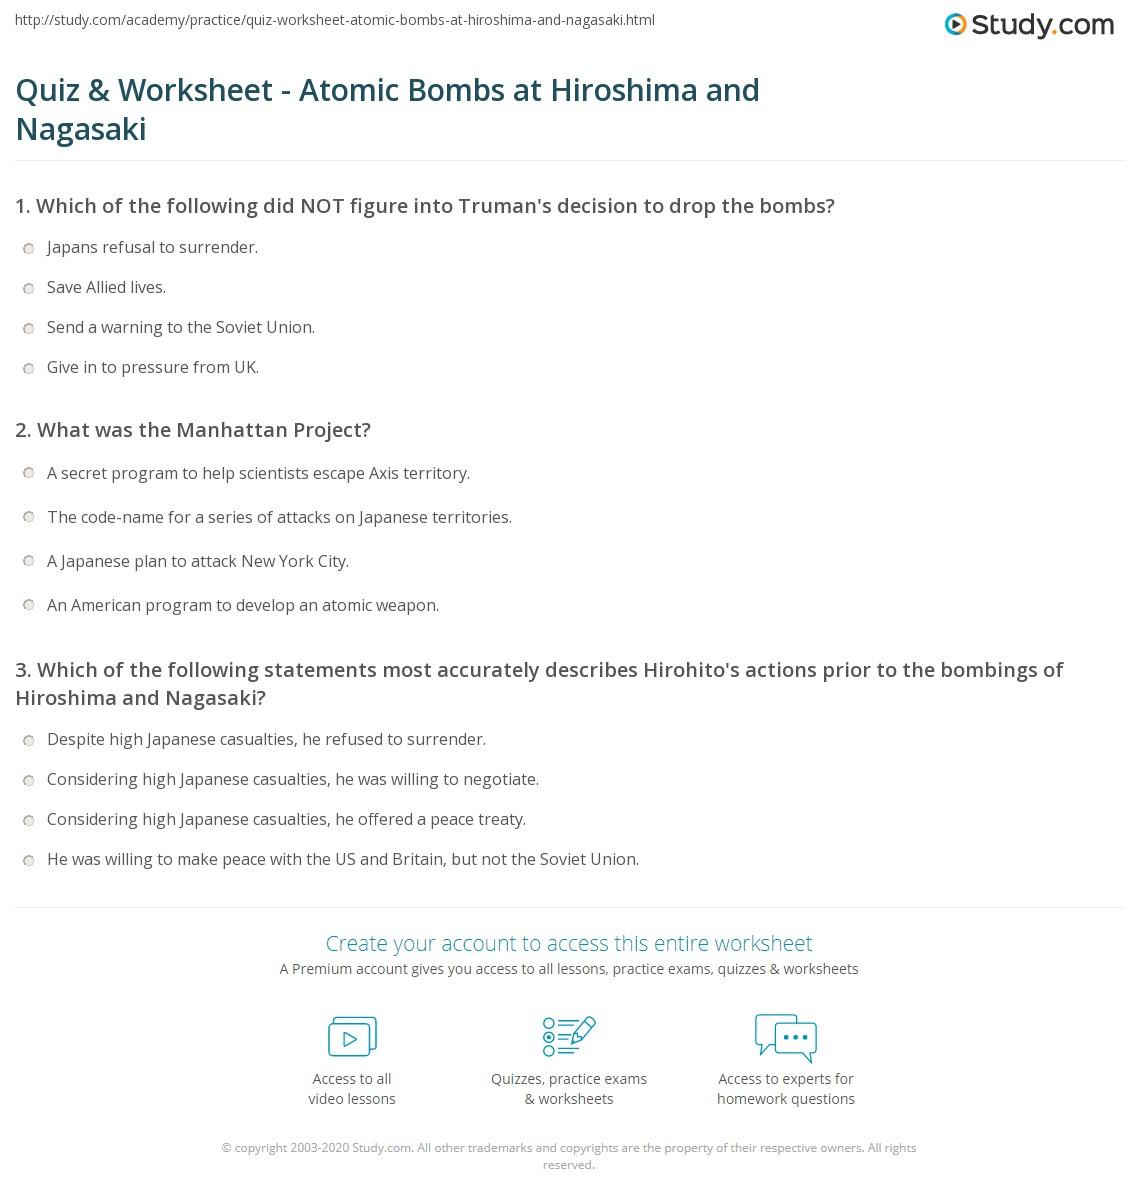 Quiz & Worksheet - Atomic Bombs at Hiroshima and Nagasaki | Study.com